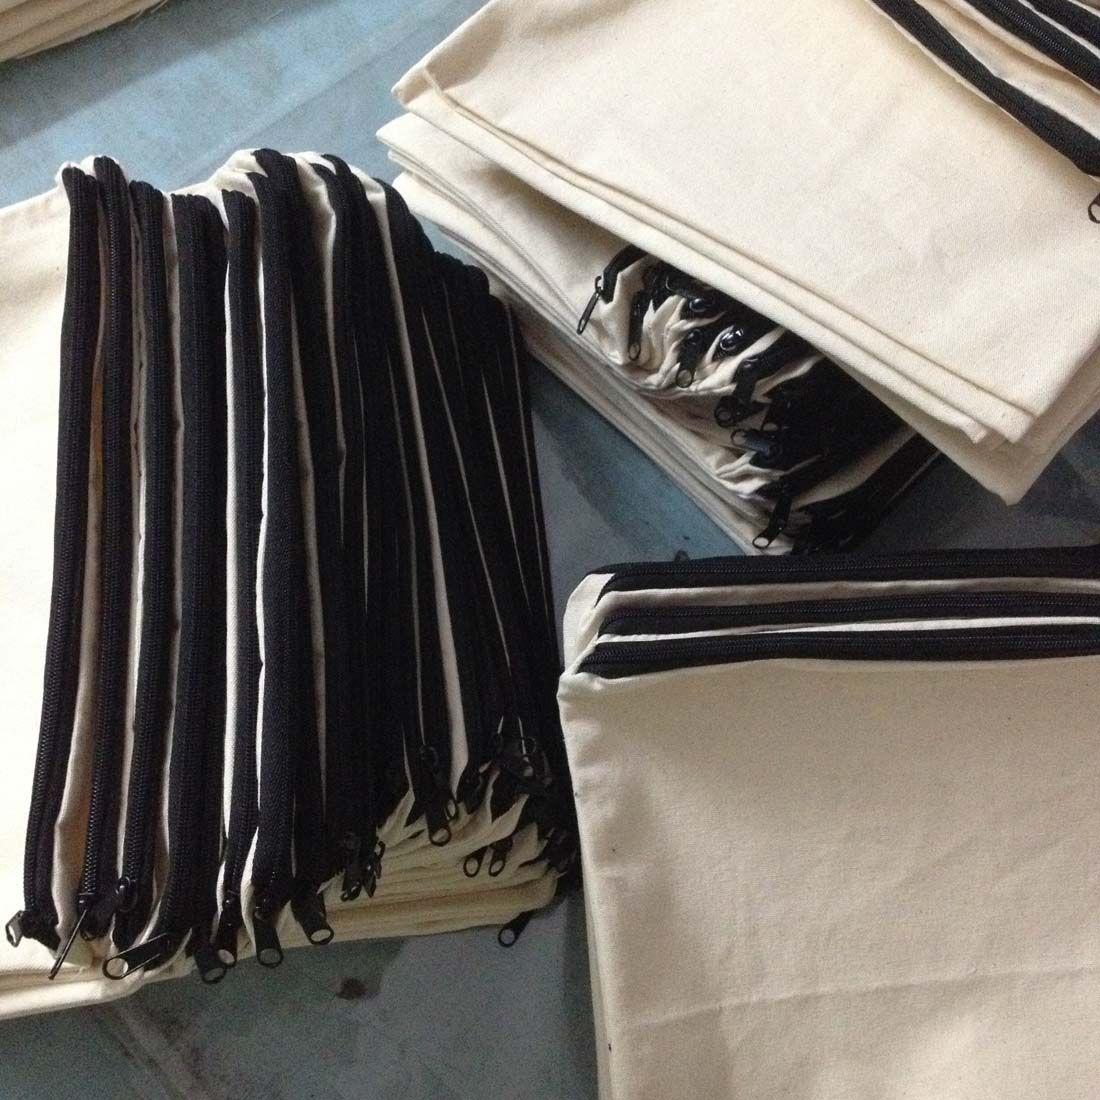 plain natural light ivory/black color pure cotton canvas coin purse with black zipper unisex casual wallet blank cotton pouch